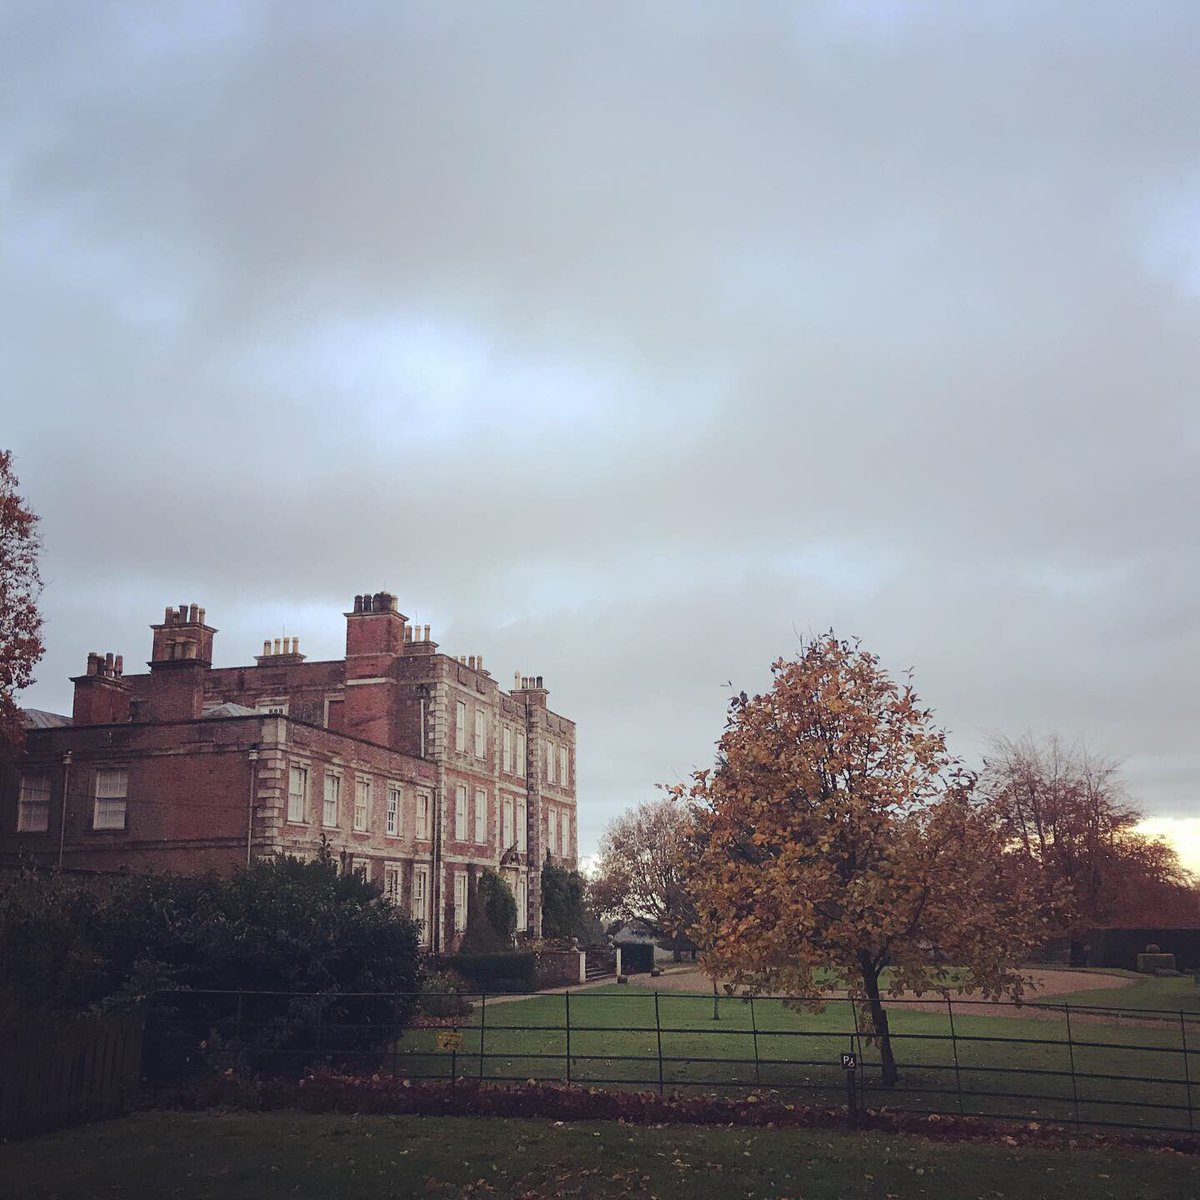 A beautiful location for today's meeting @NTGunbyHall #Autmn #Lincolnshire @EastLindseyDCpic.twitter.com/miUrdtD2os